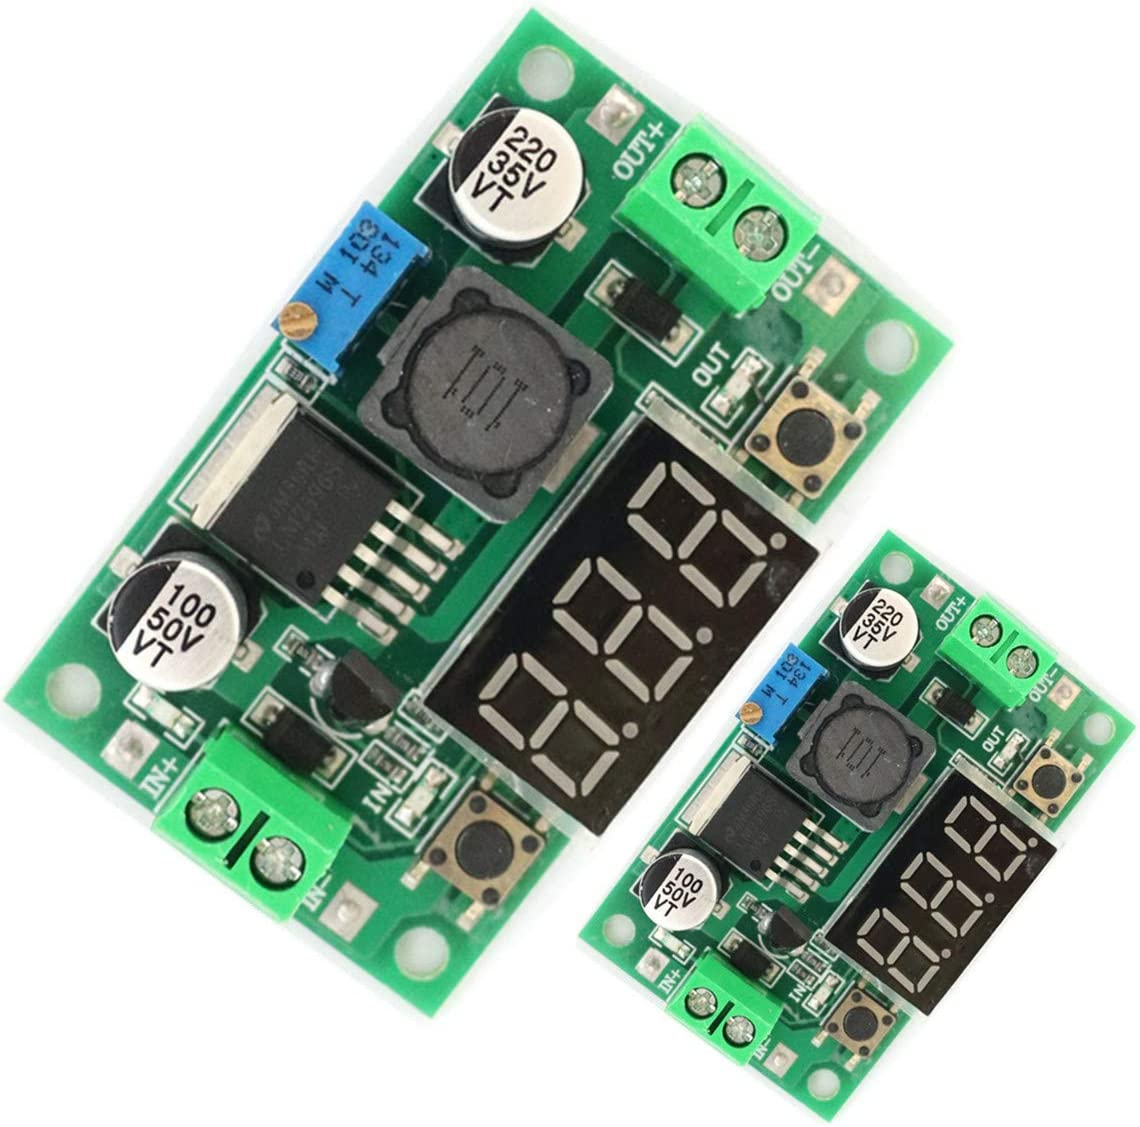 2pcs LM2596 DC to DC Voltage Regulator 4-40V to 1.5-35V 2A Buck Converter with LED Display